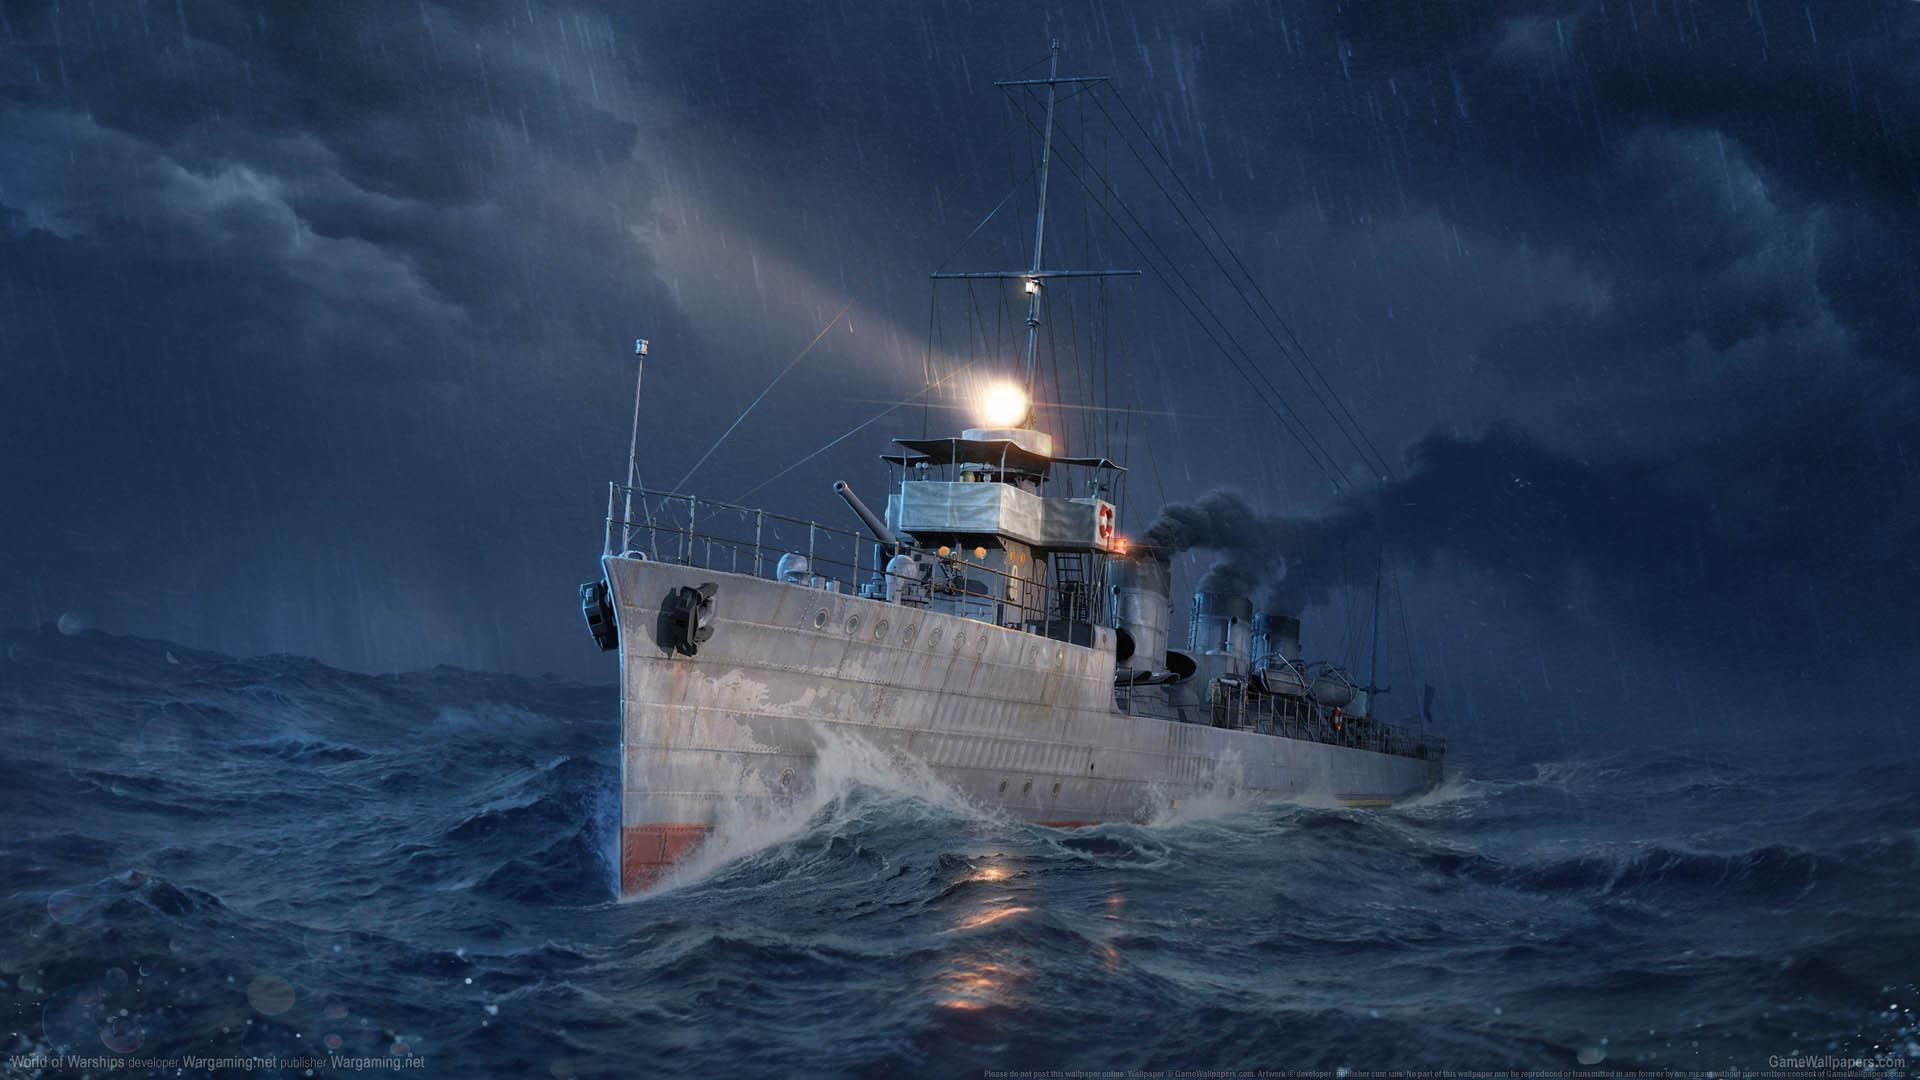 World Of Warships Wallpaper: World Of Warships Wallpaper 08 1920x1080